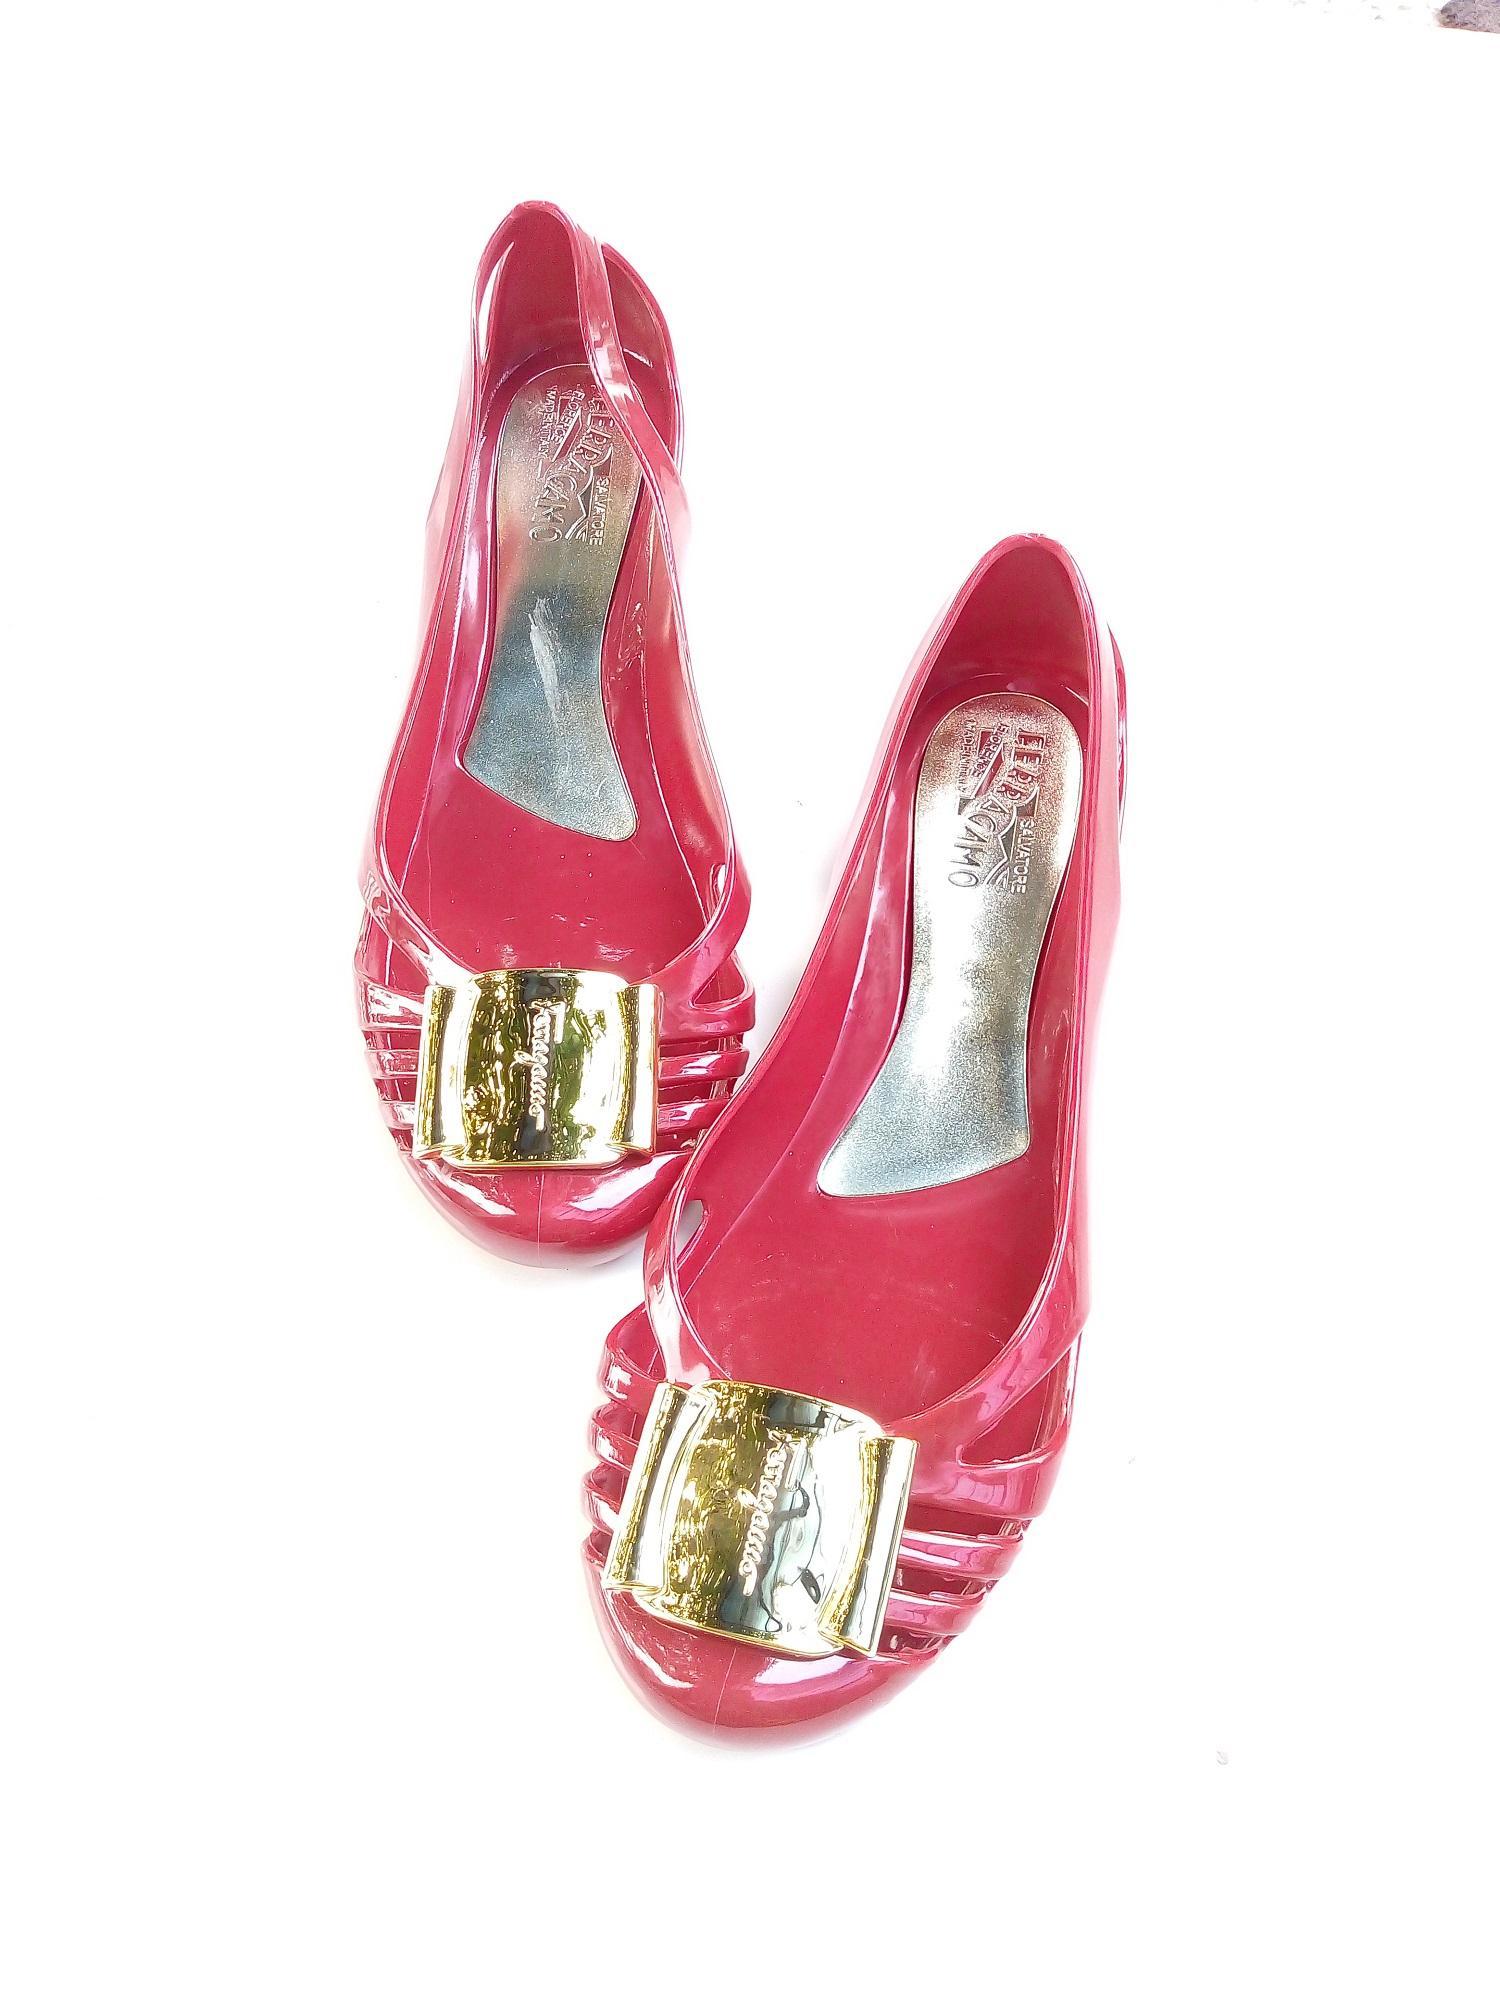 Myanka Jelly Shoes Flat Ferrag Standar - Merah -